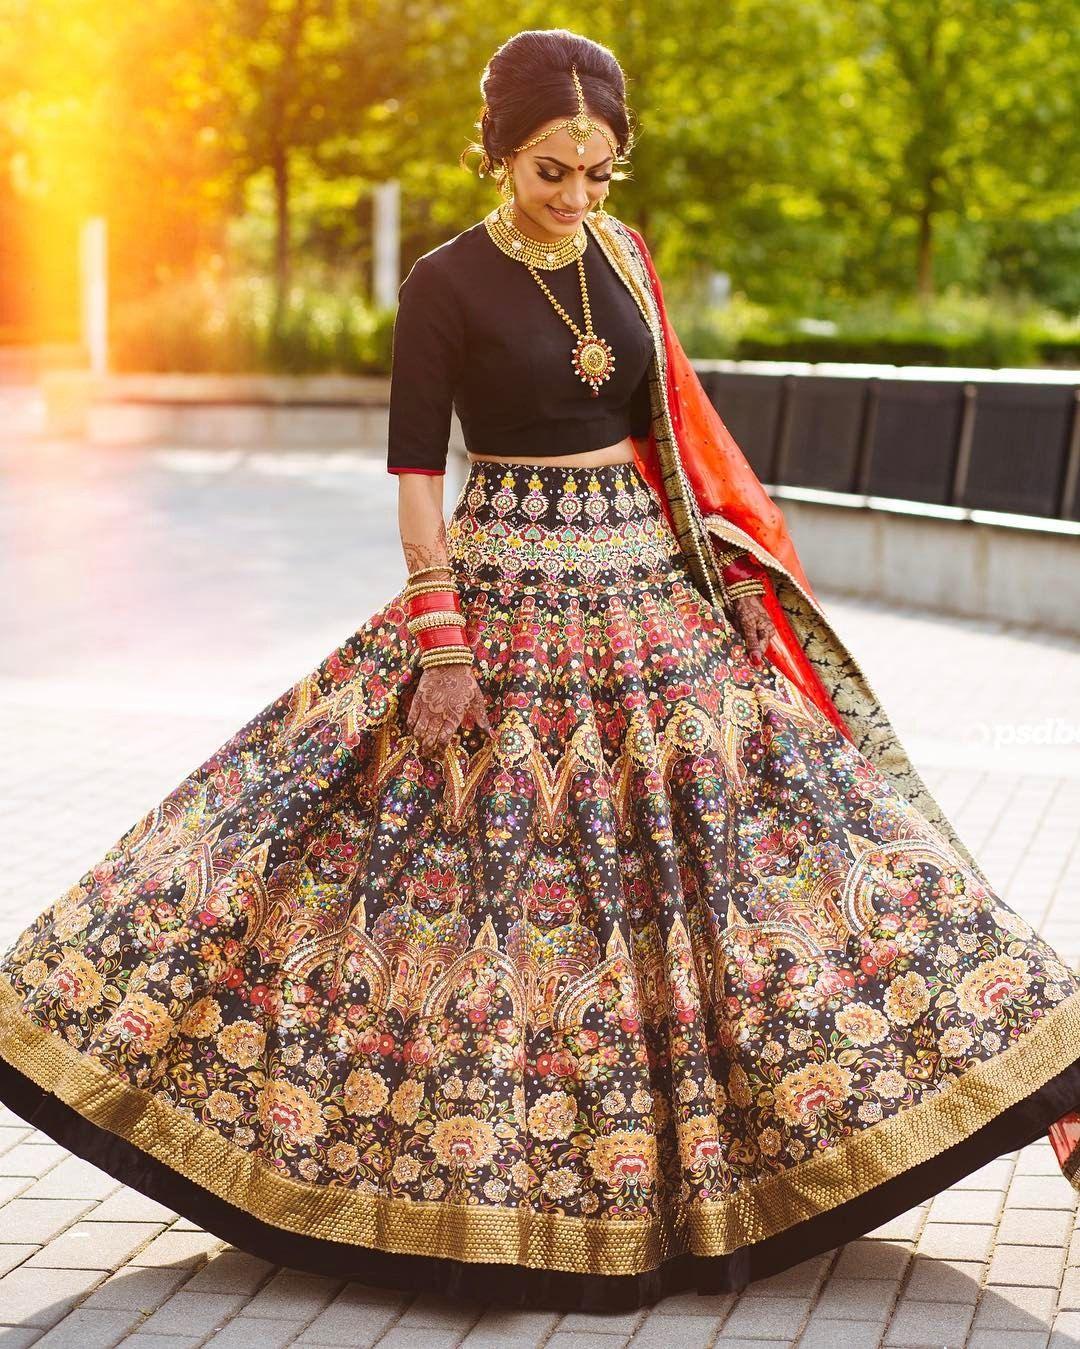 Indian Wedding Dress: Pin By Mariam Ismail On Pakistani Fashion